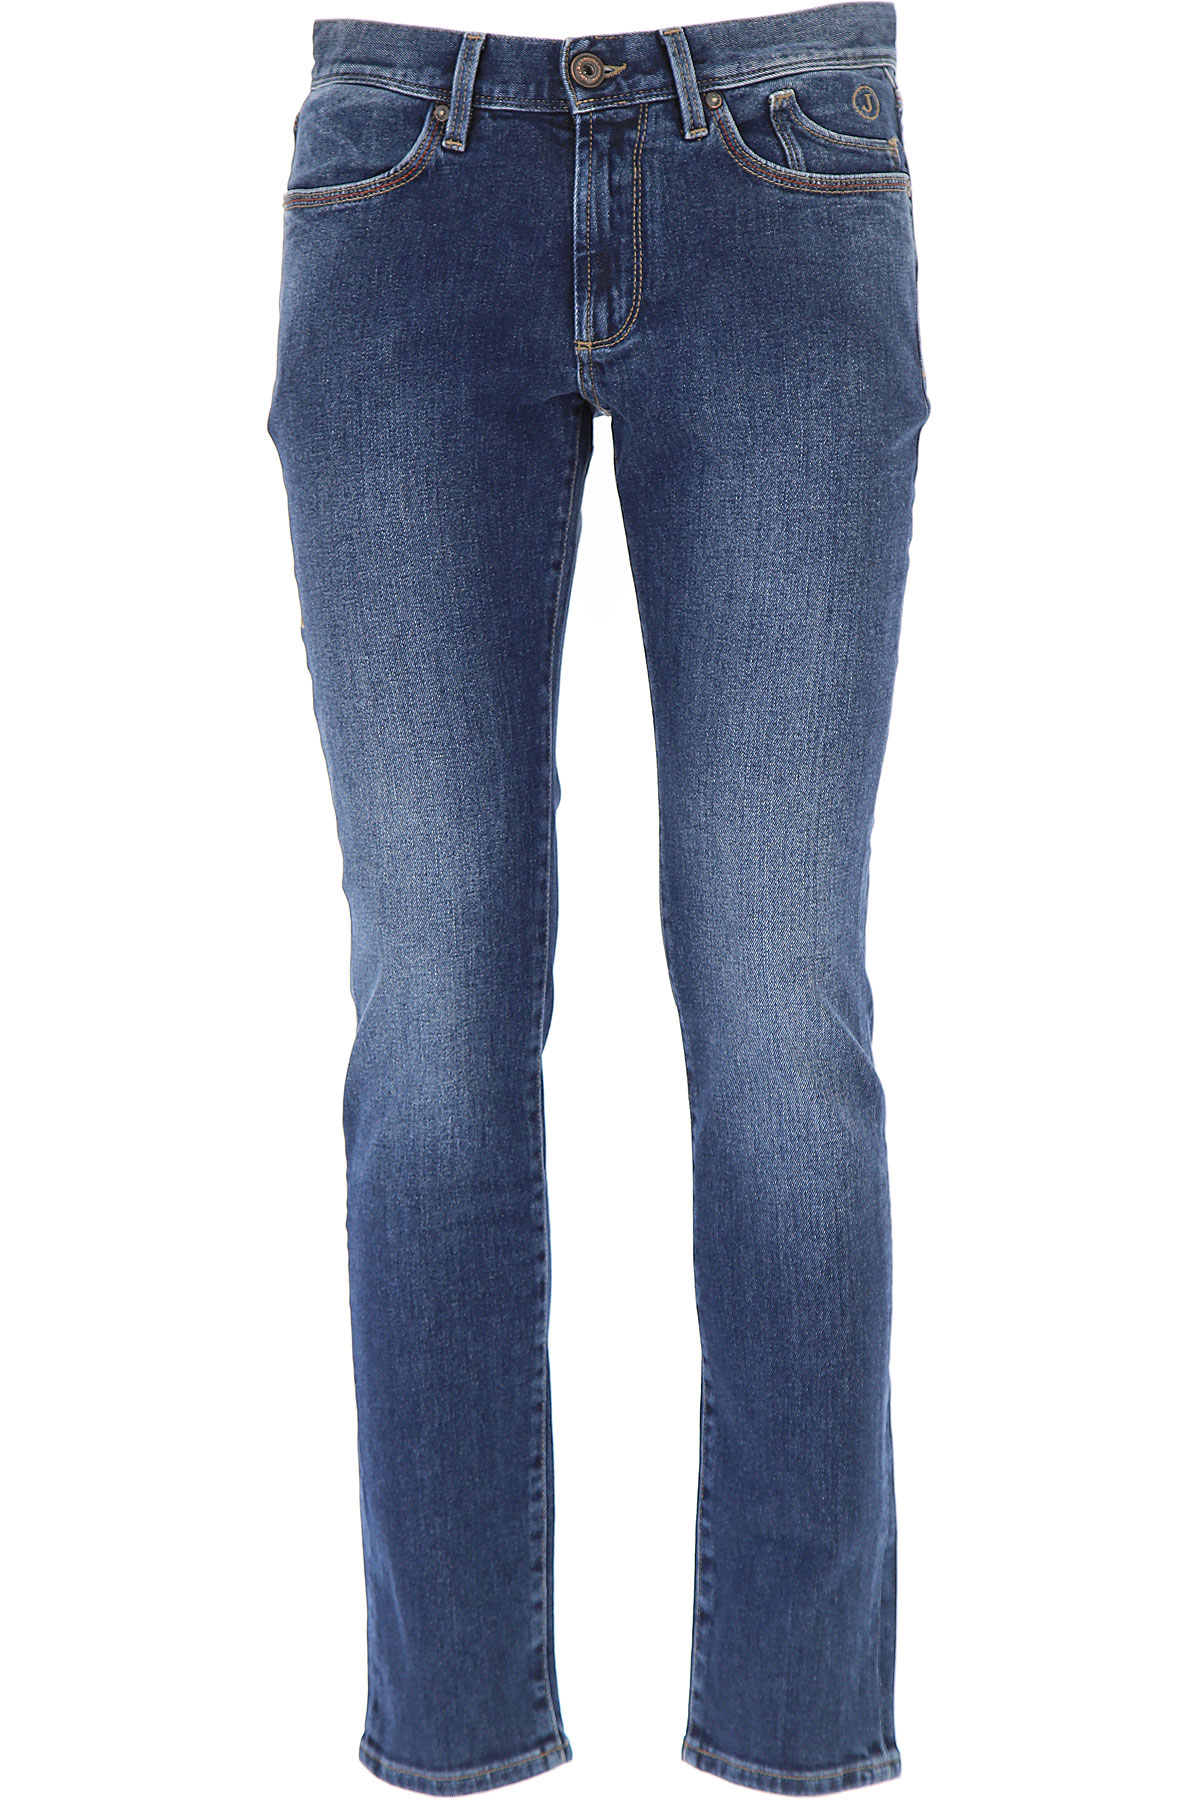 Image of Jeckerson Jeans, Blue Dark, Cotton, 2017, 30 31 32 34